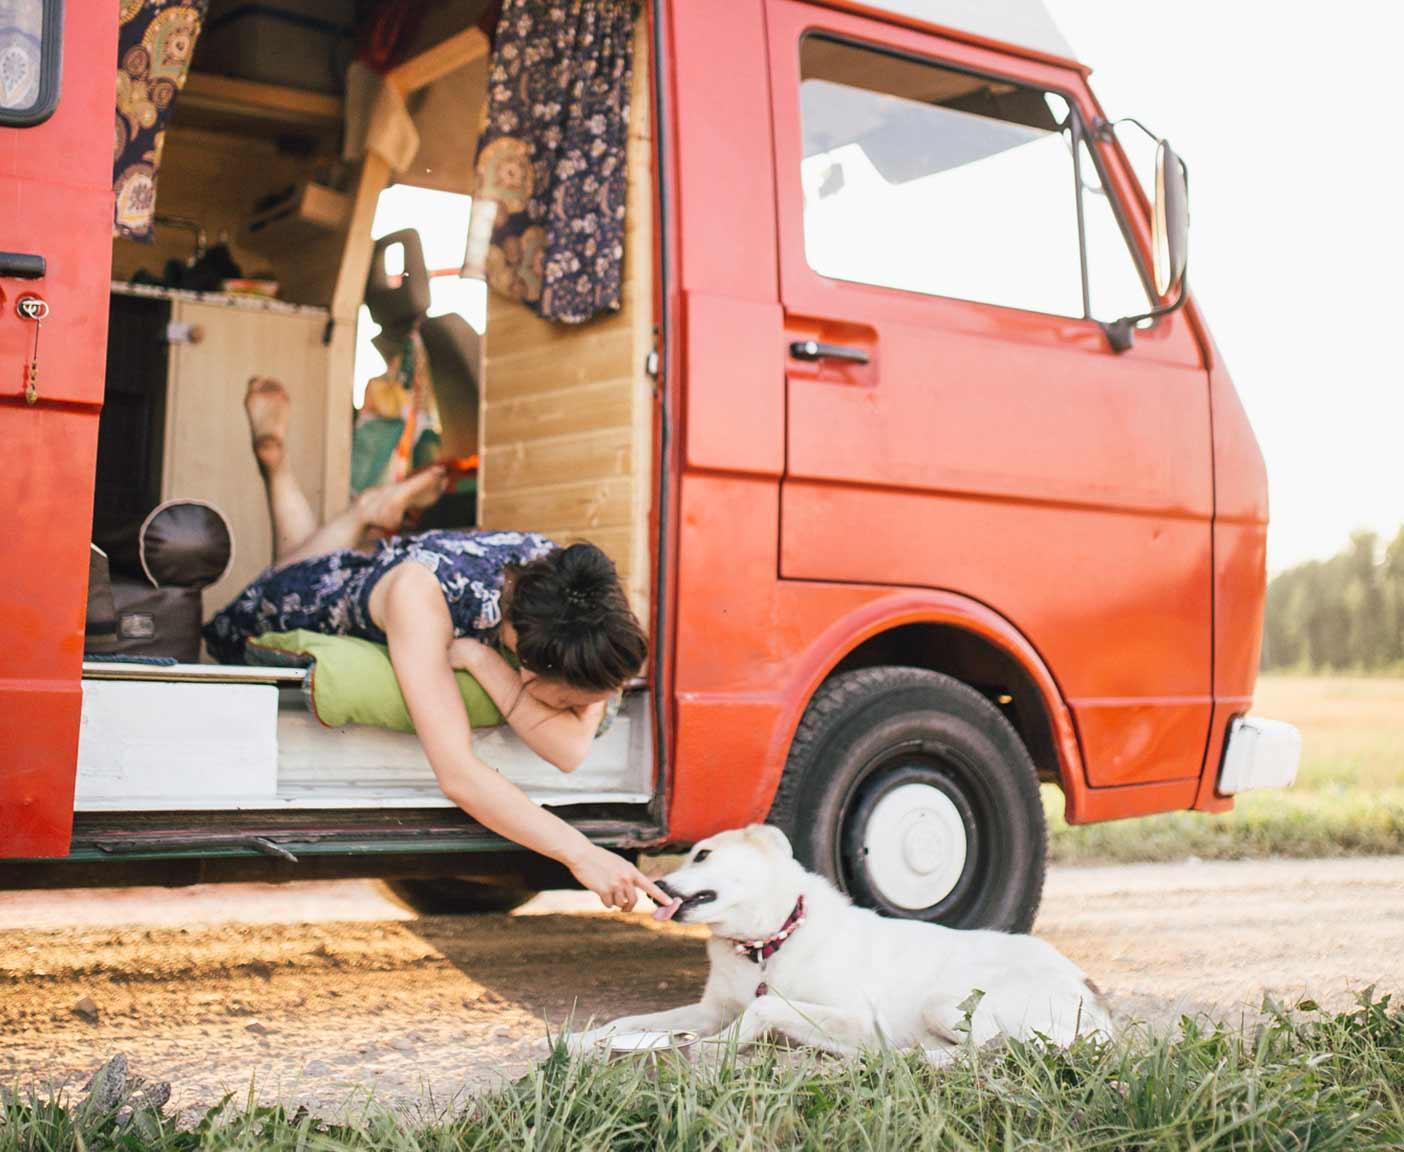 hund-im-wohnmobil-reisen-vw-lt-28-wohnmobil